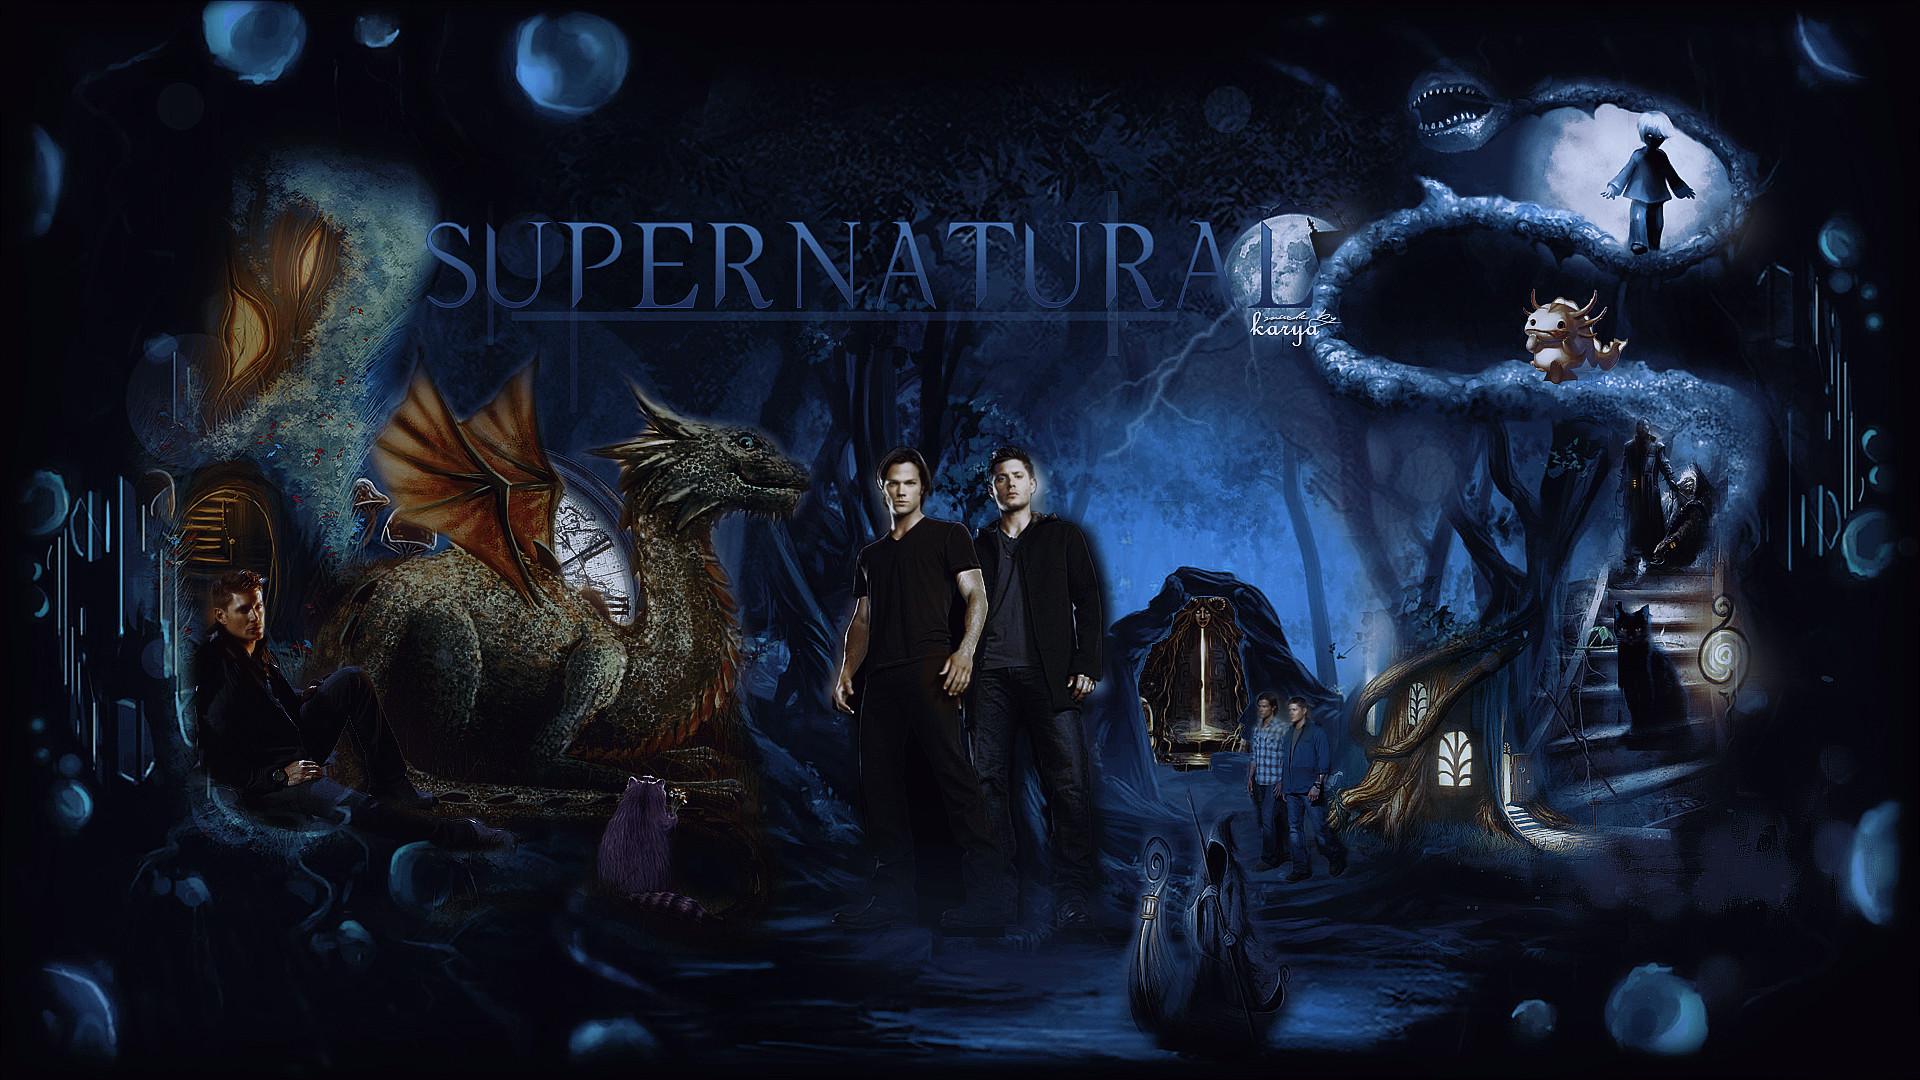 Supernatural Season 10 100% Quality HD Live Wallpaper – DSC671671 Screenshot